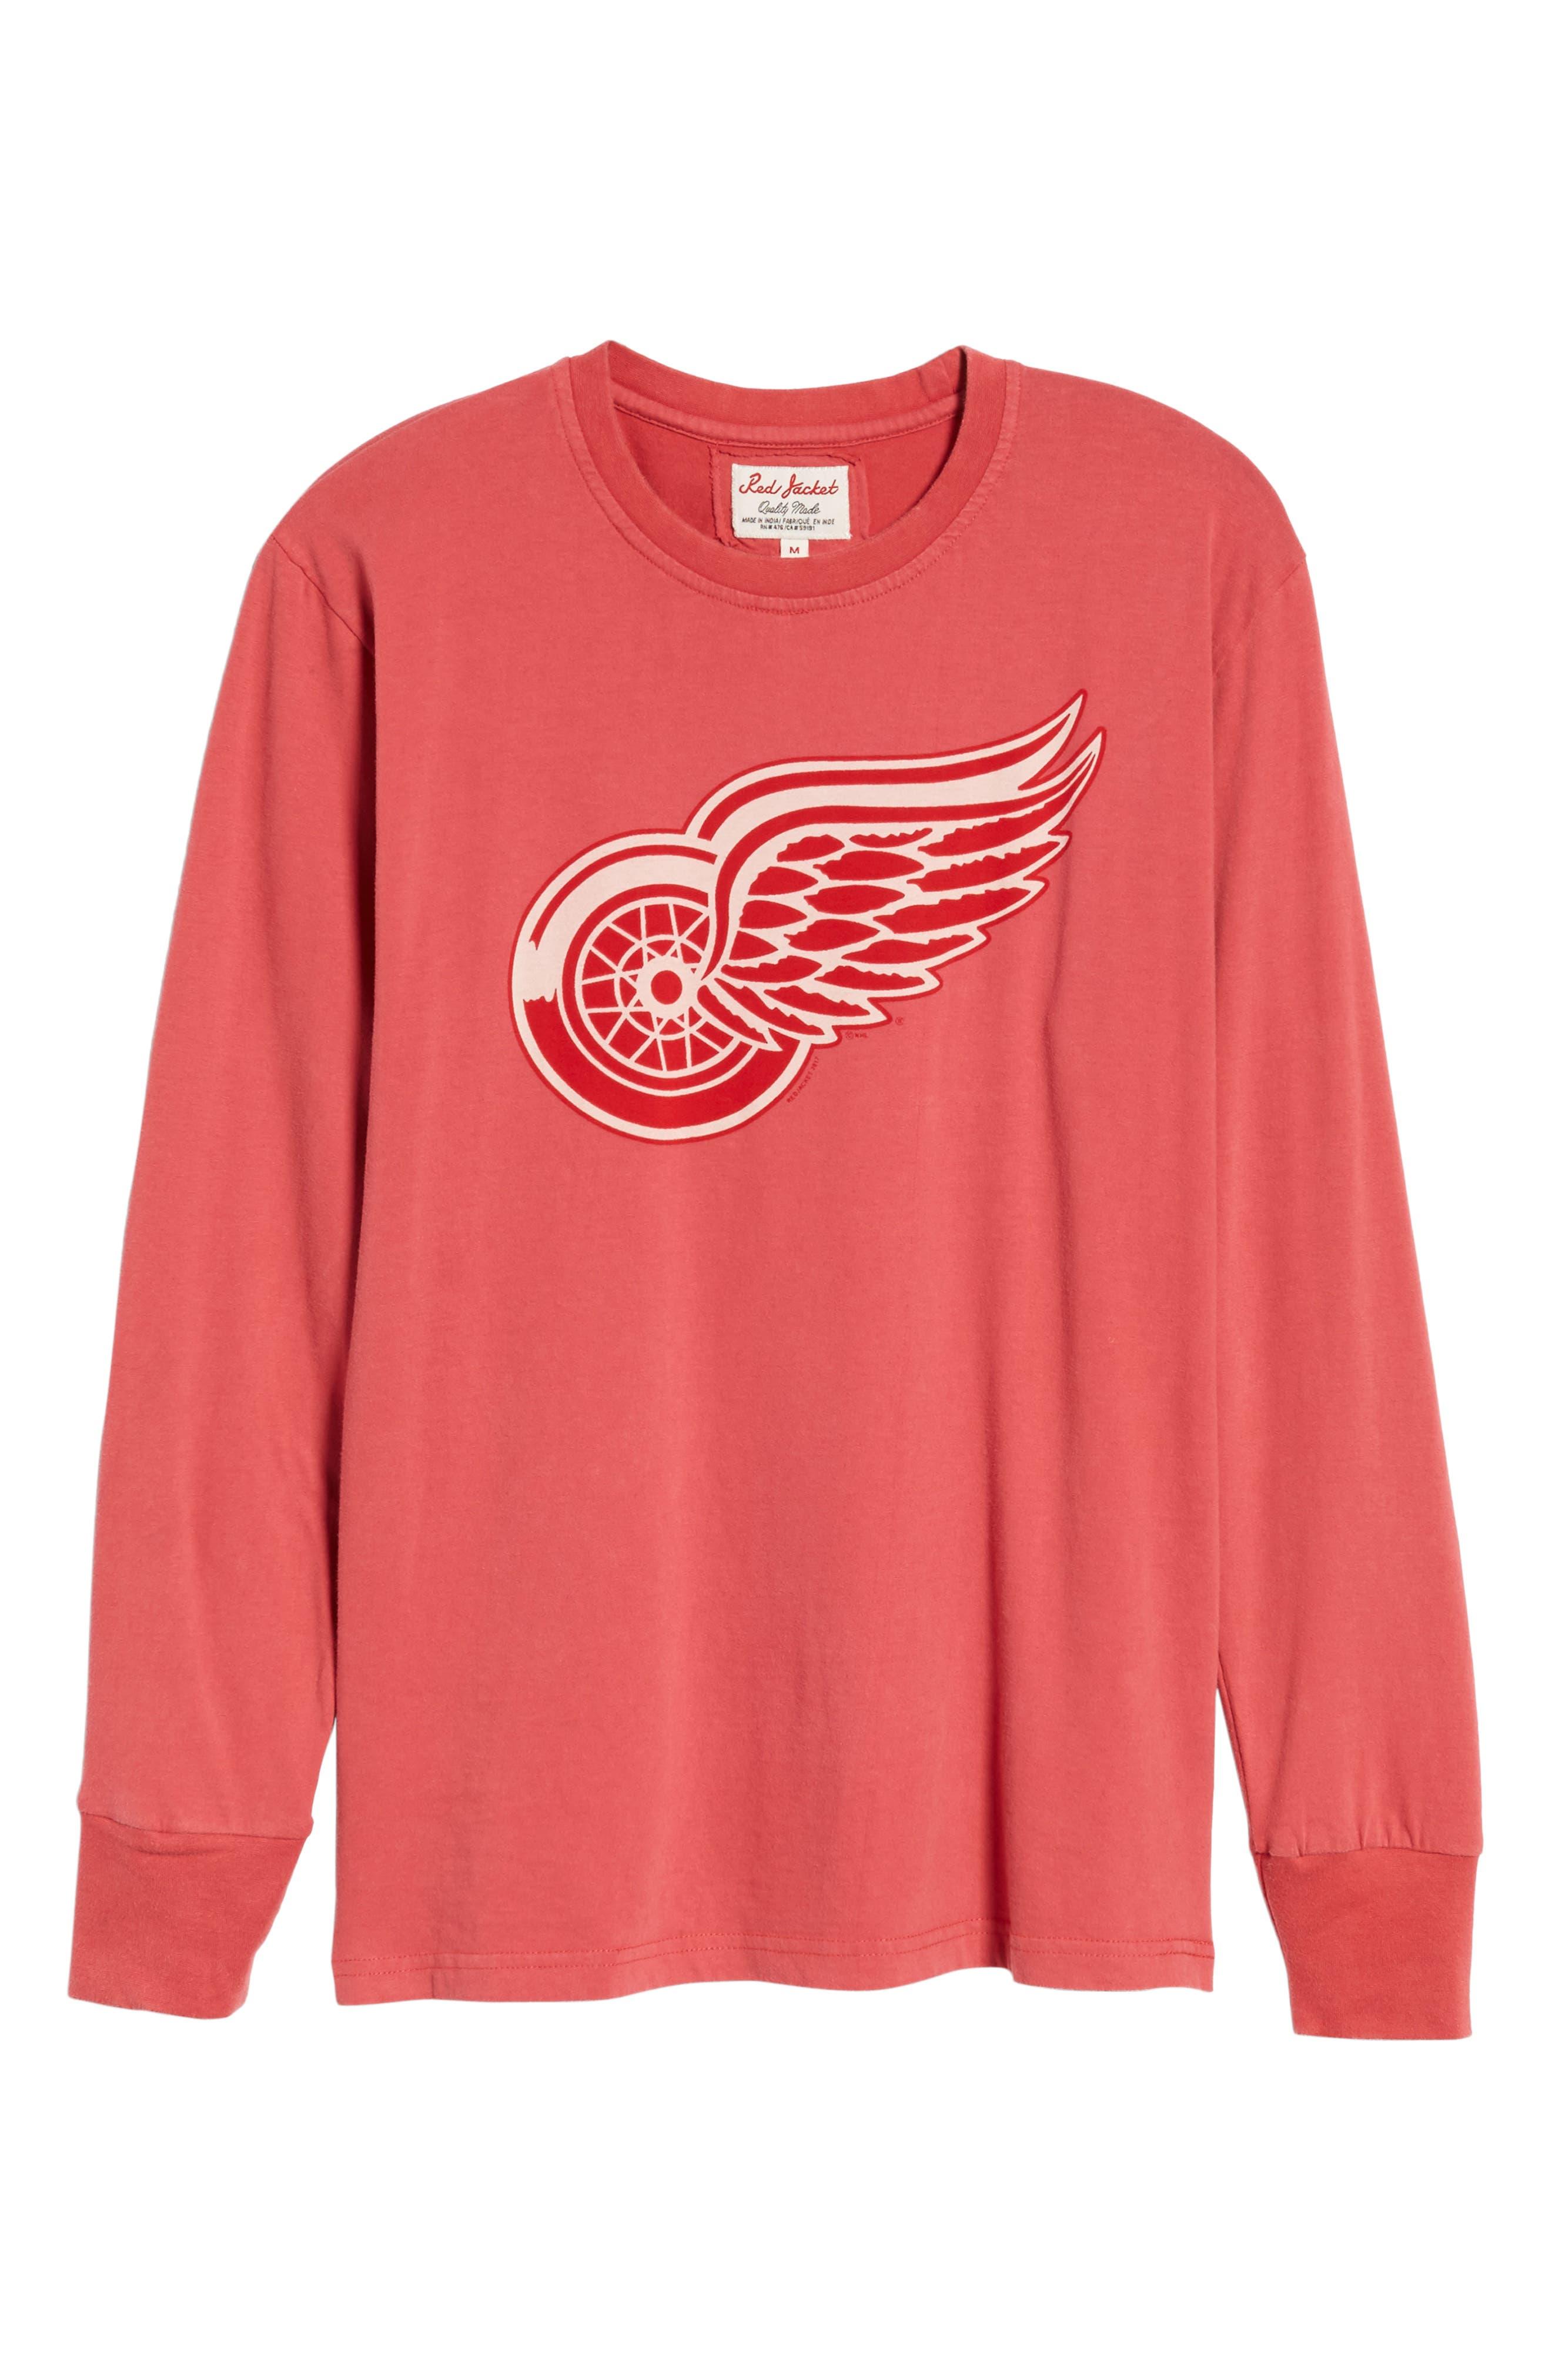 Gresham Red Wings T-Shirt,                             Alternate thumbnail 6, color,                             Red